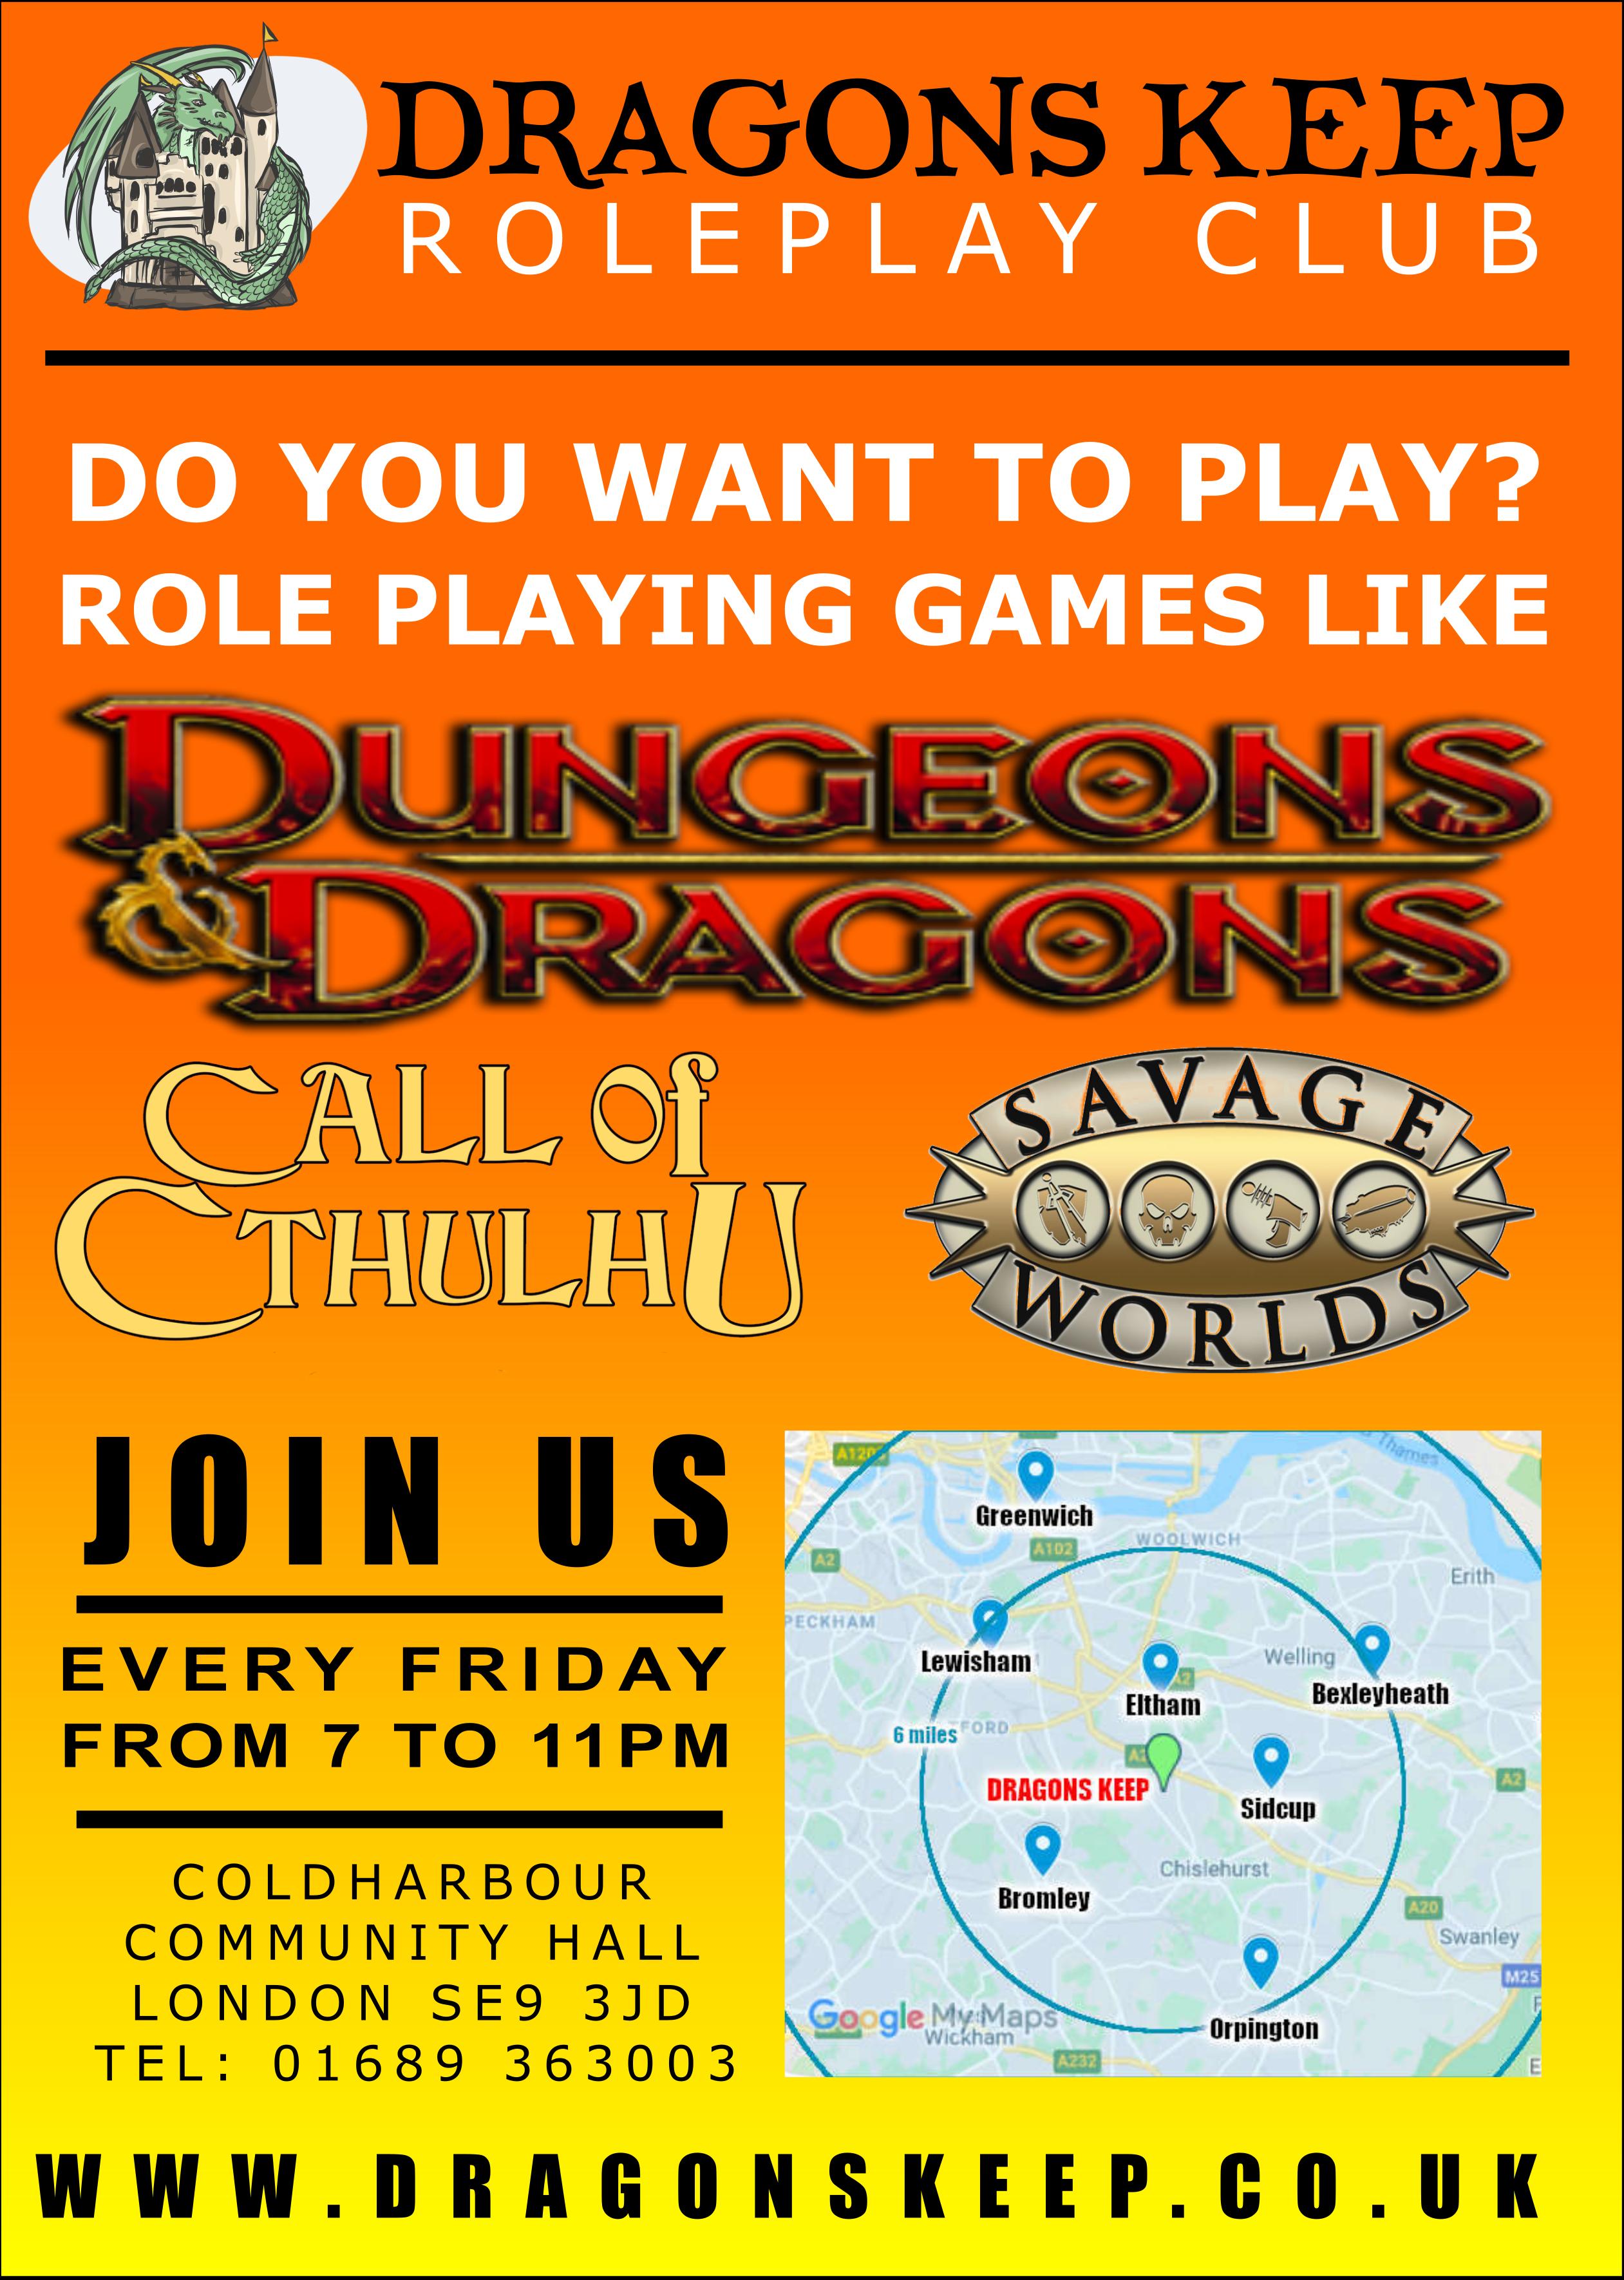 Dragons Keep Role Play Club